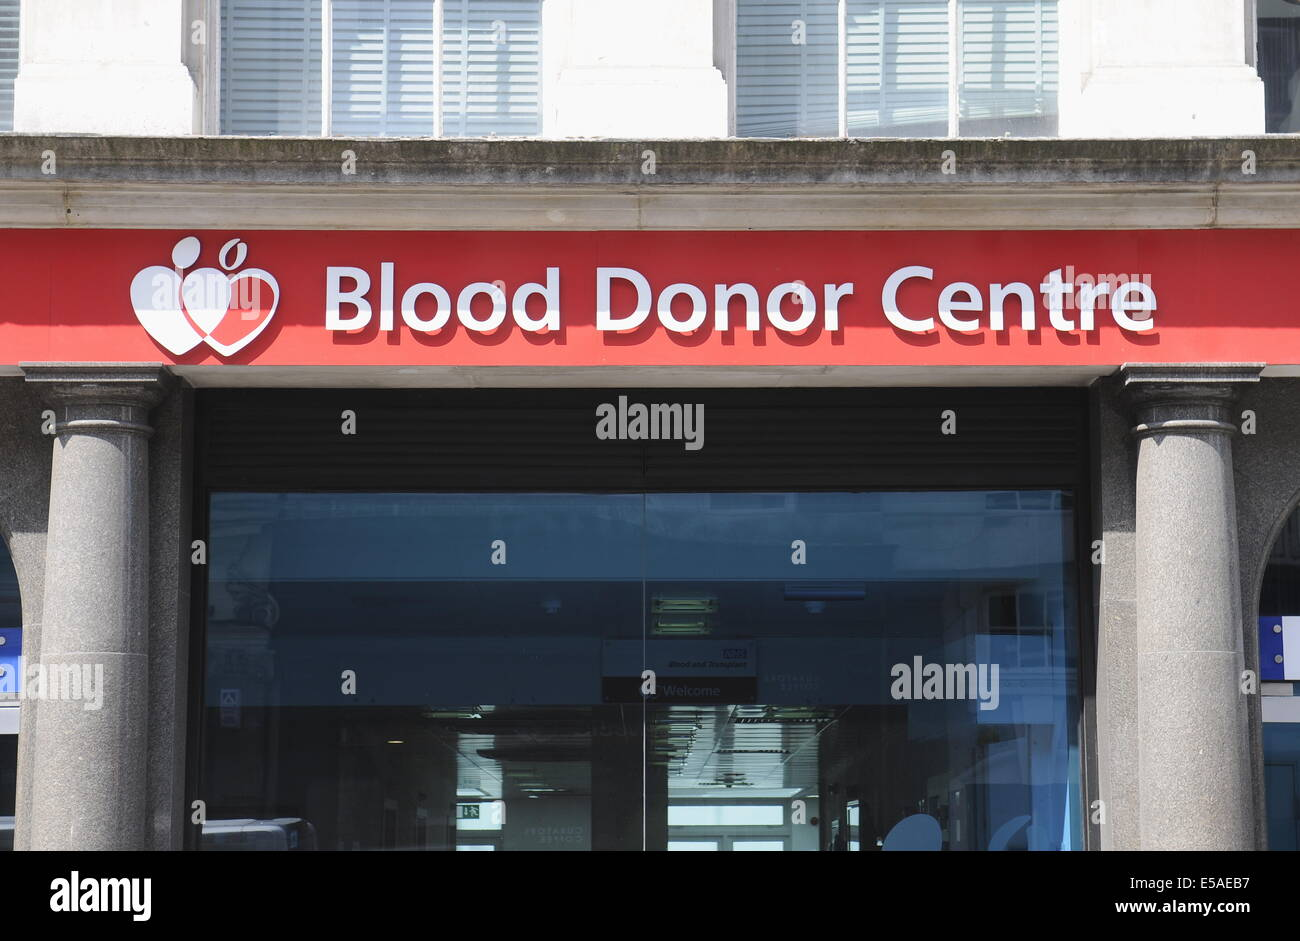 Blood Donor Centre,Margaret Street,London.UK - Stock Image